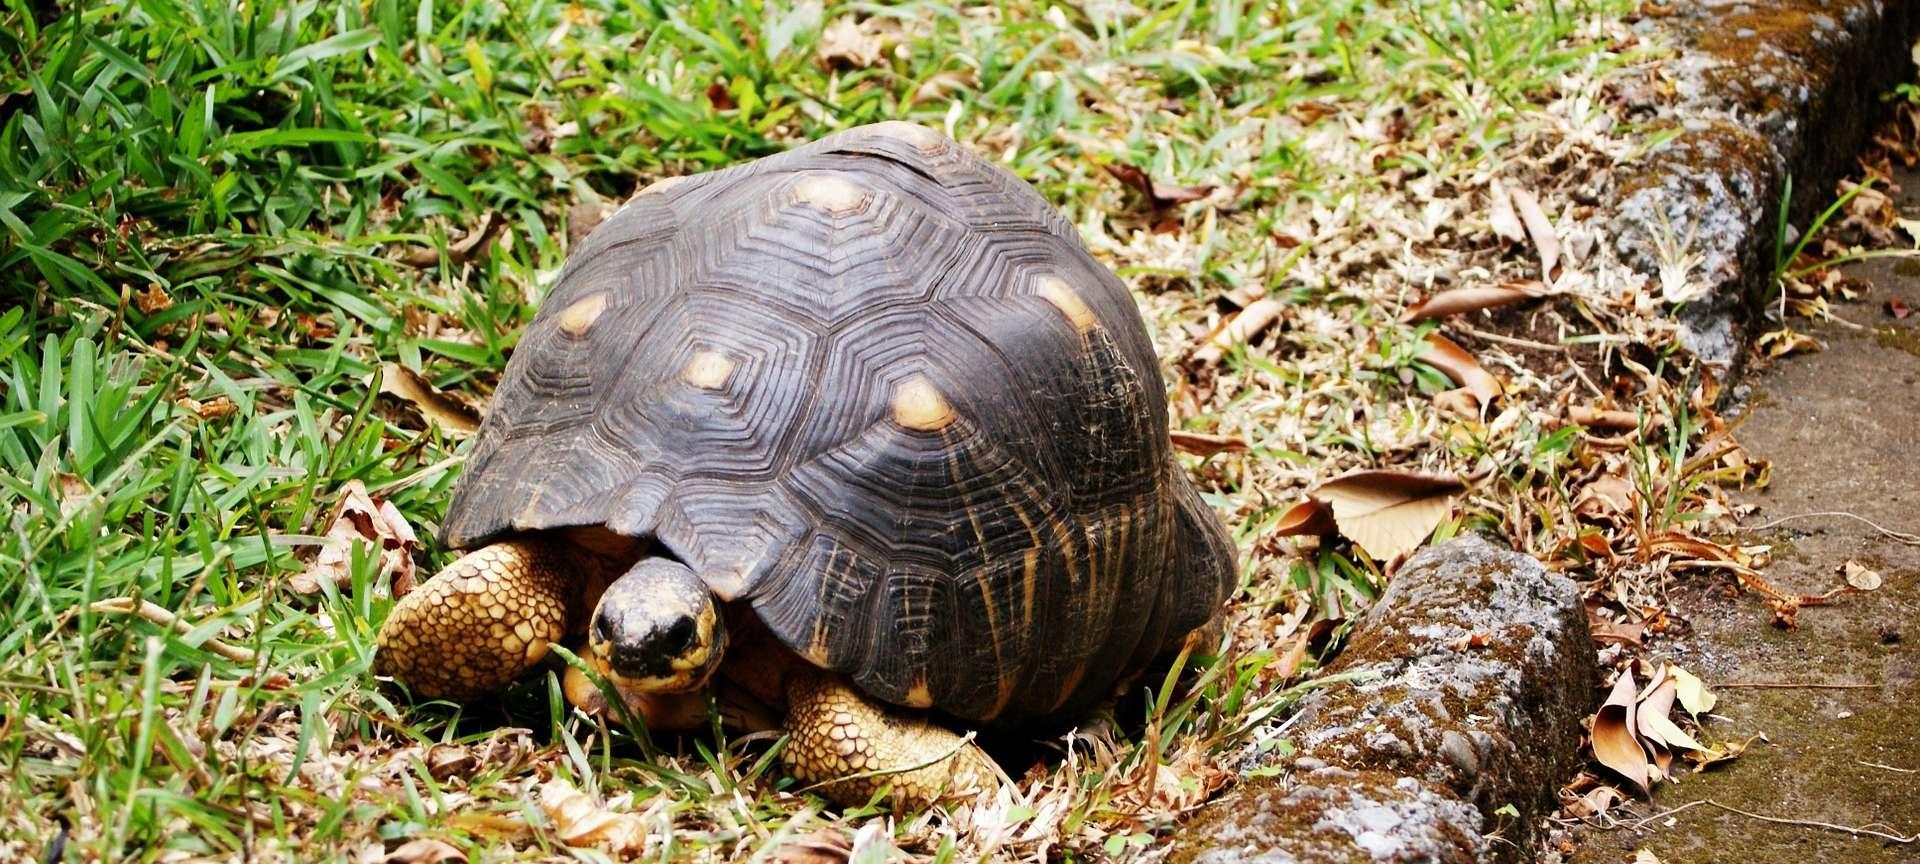 Réunion Island - Africa Wildlife Safaris